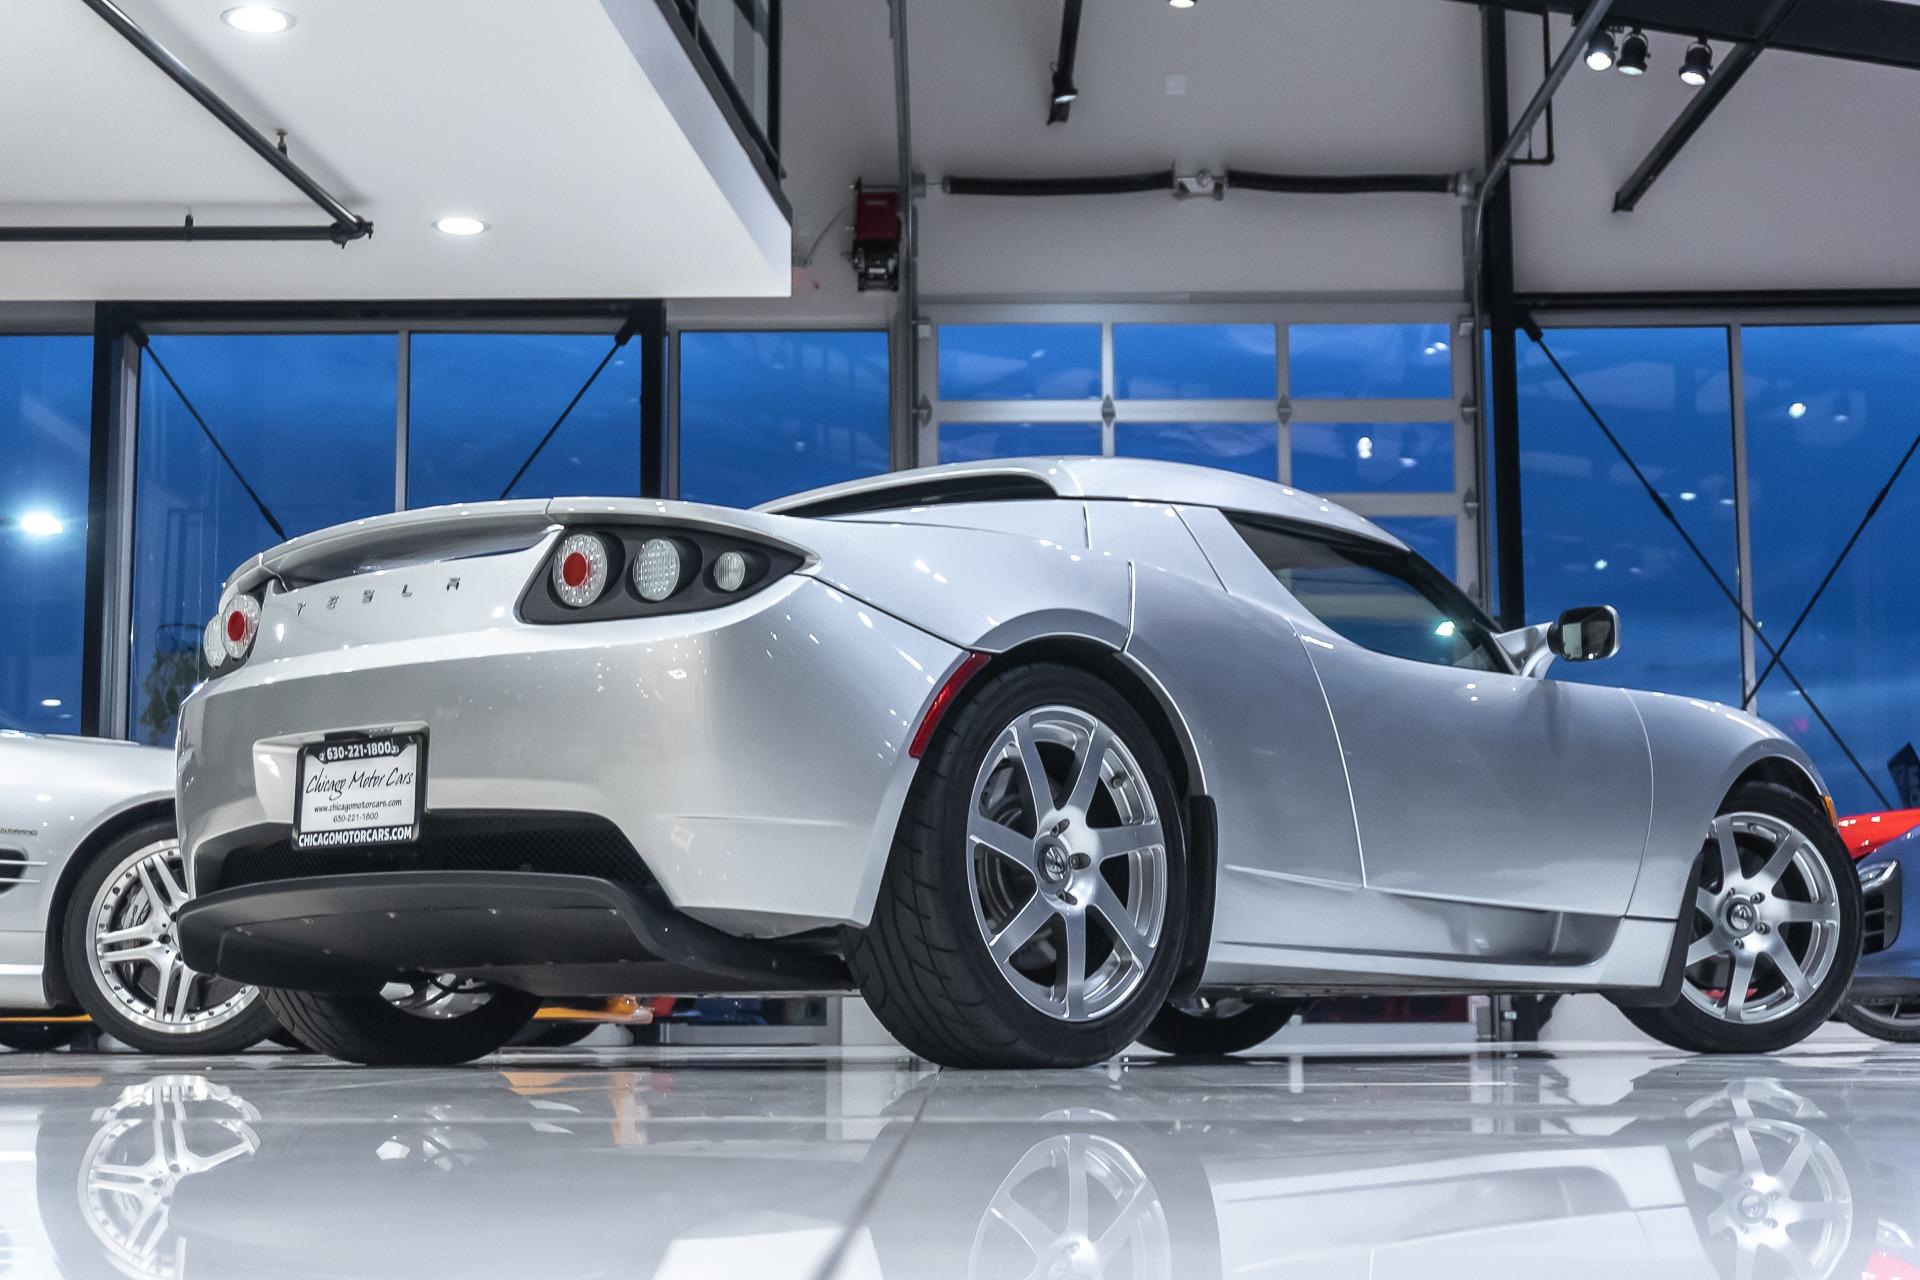 Used-2008-Tesla-Roadster-VERY-RARE-EXAMPLE-1-OF-2450 (19).jpg